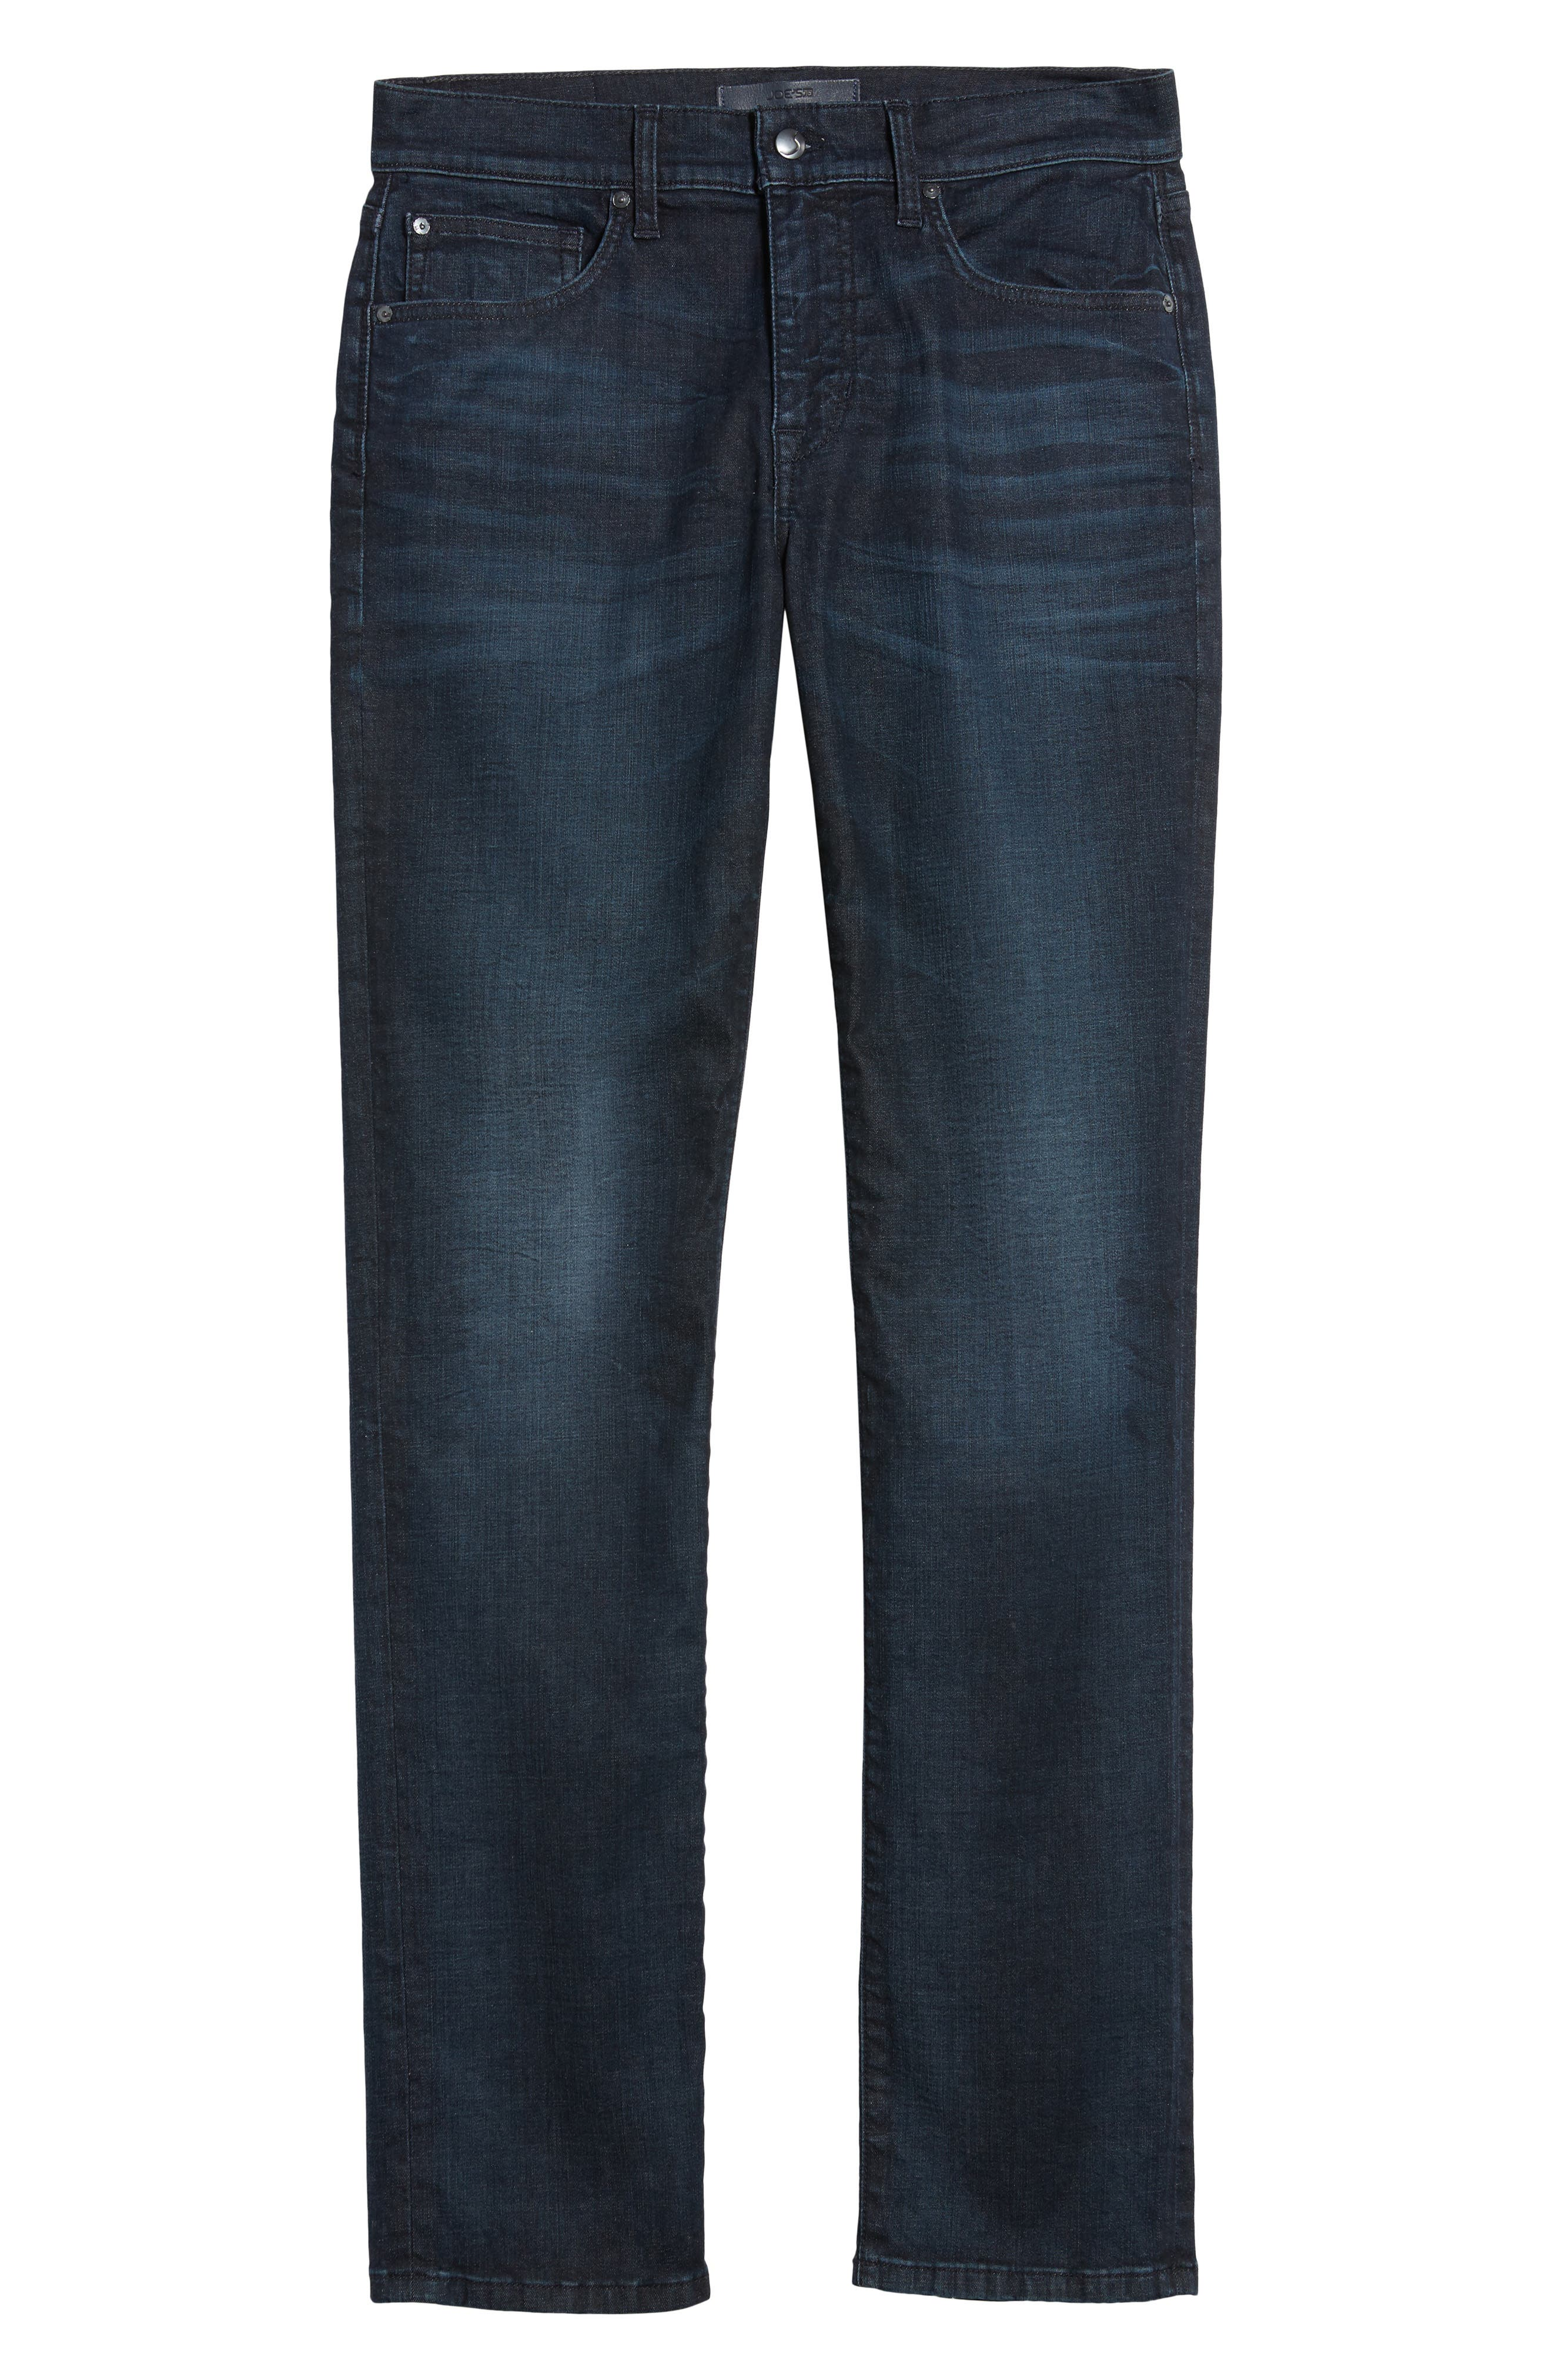 Brixton Slim Straight Leg Jeans,                             Alternate thumbnail 6, color,                             Larsen